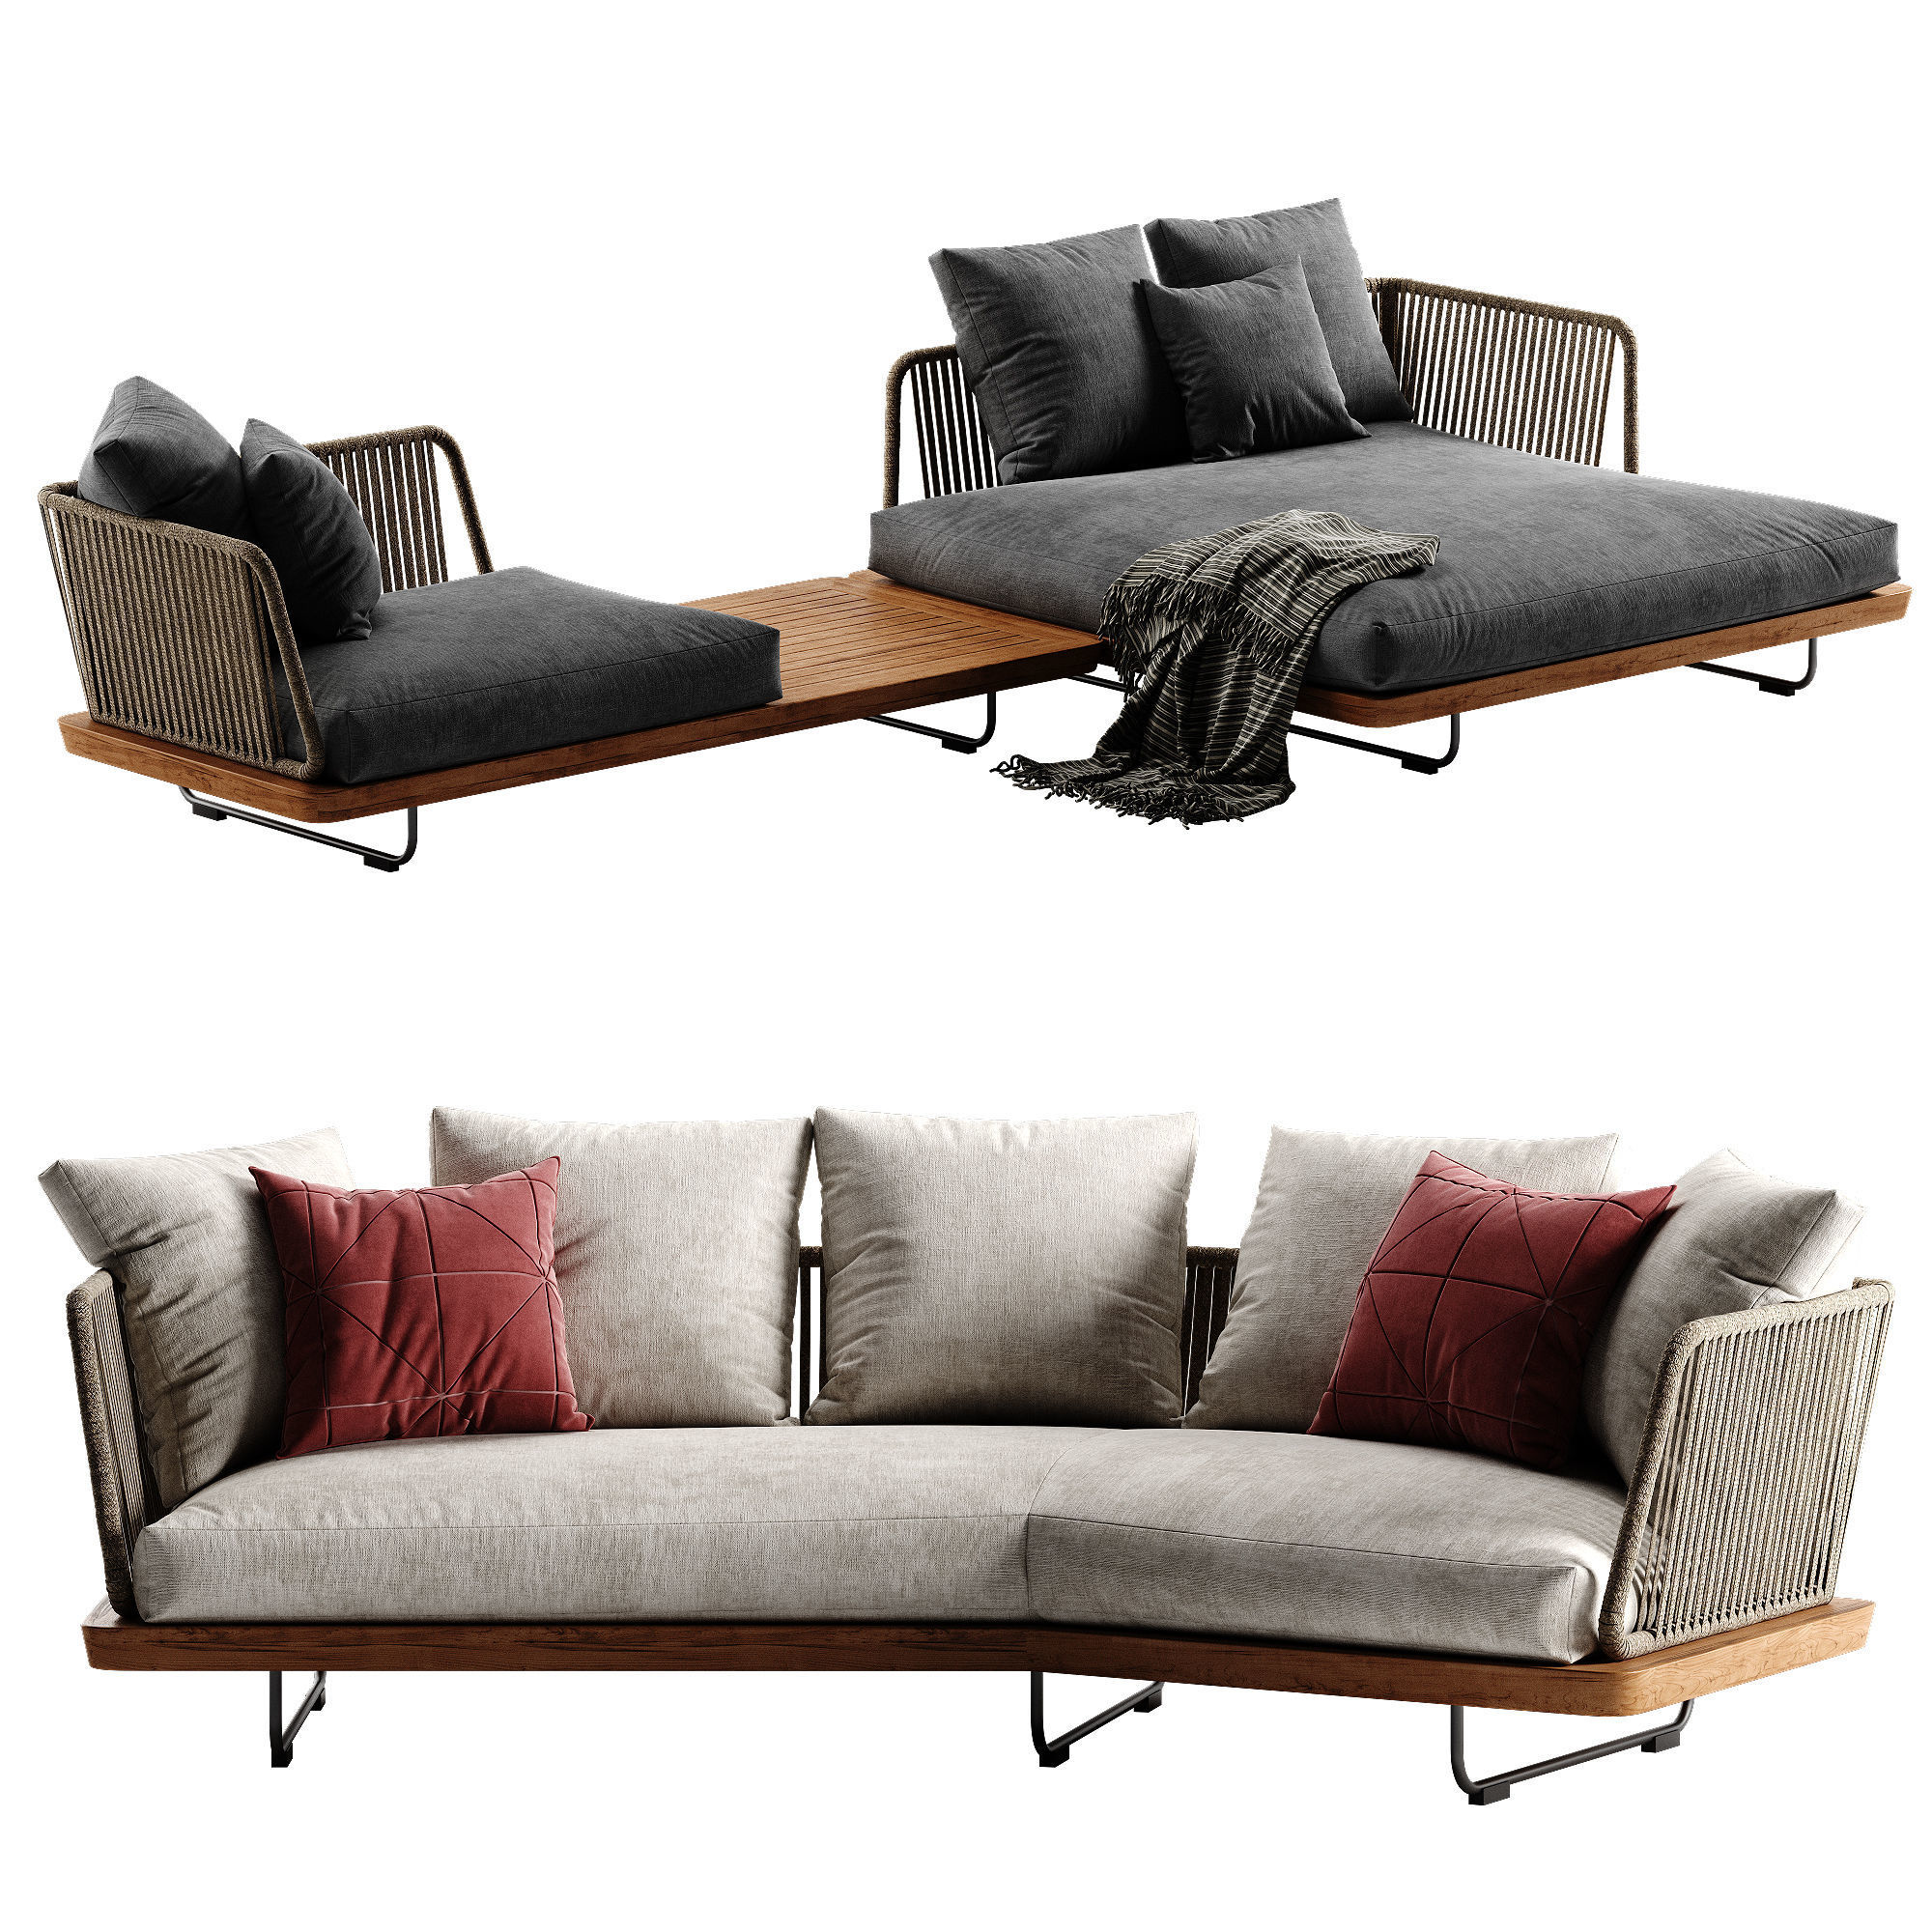 Minotti Sunray sofa set 2 3D model | CGTrader